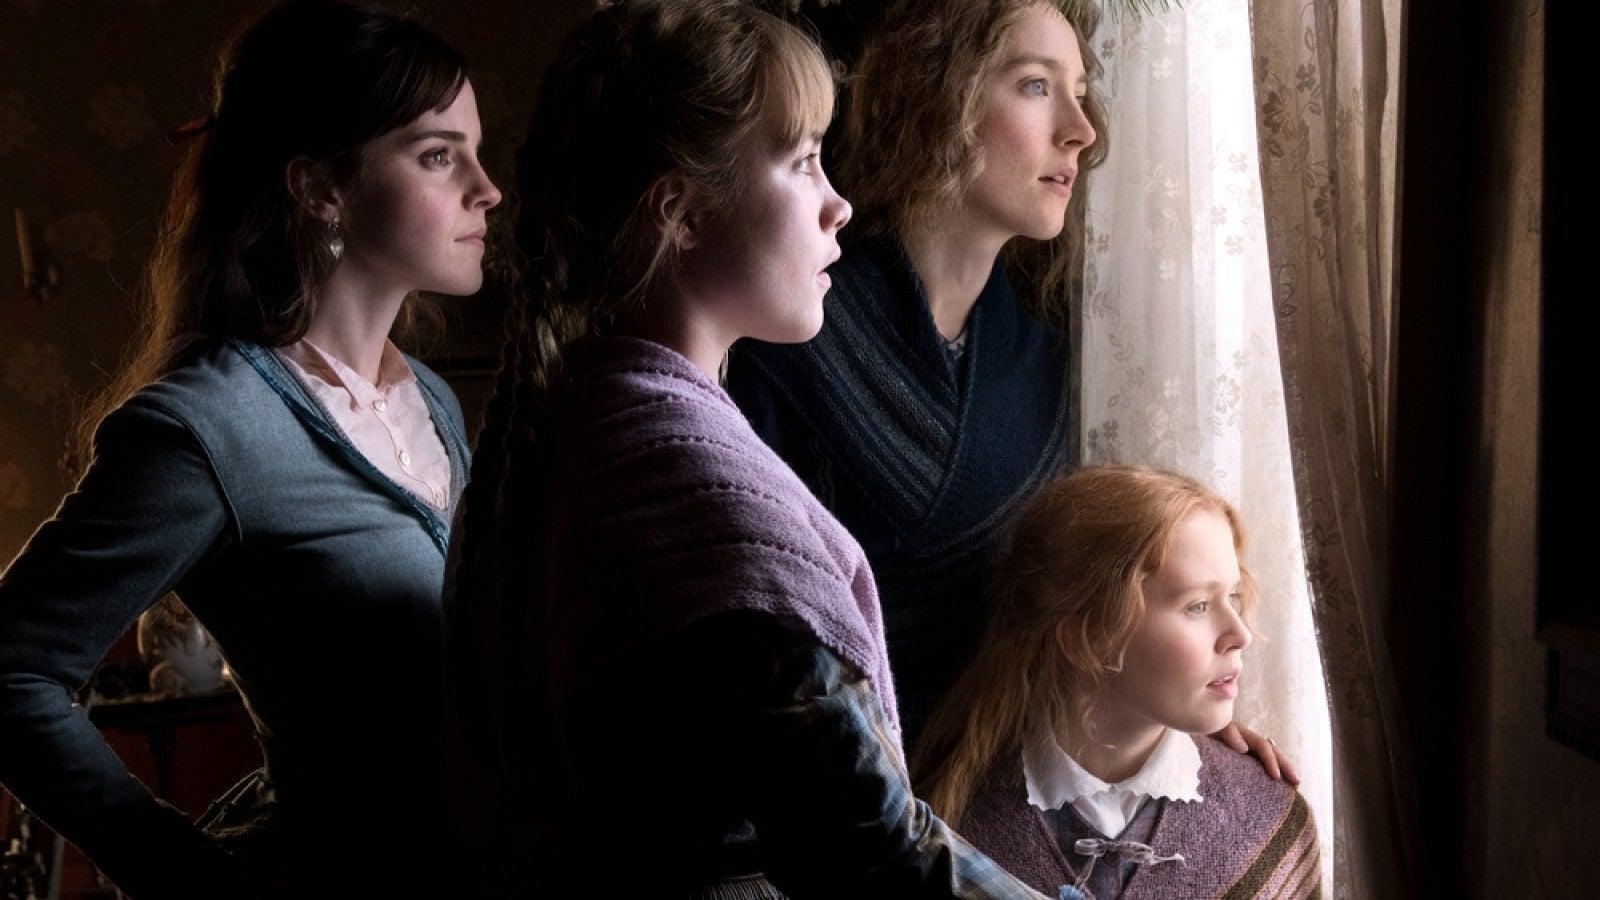 Little Women trailer: Saoirse Ronan, Emma Watson and